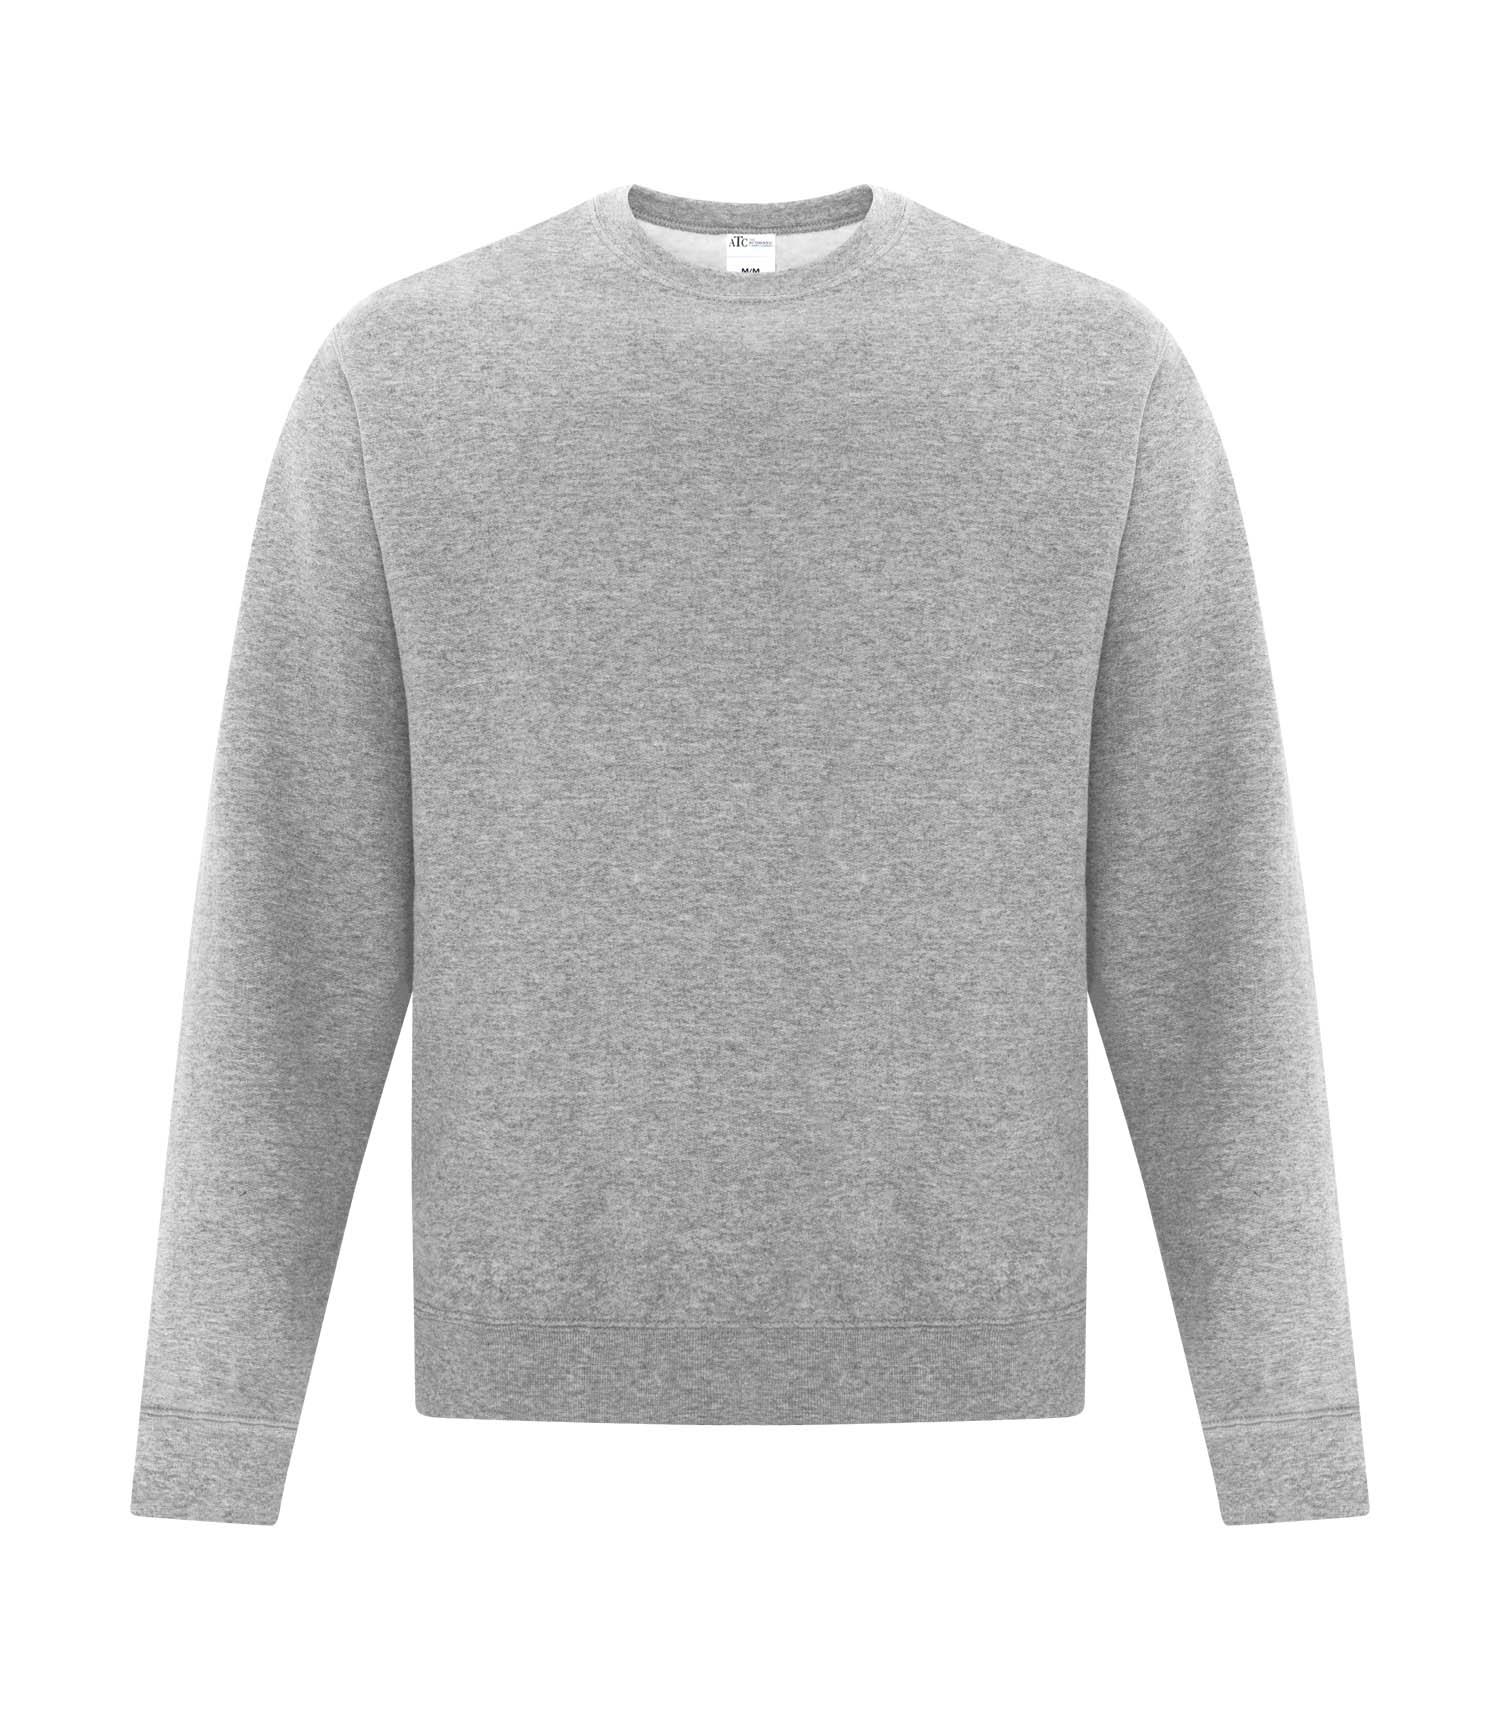 94e5d10a2 Design Now. ATCTM Everyday Fleece Crewneck Sweatshirt